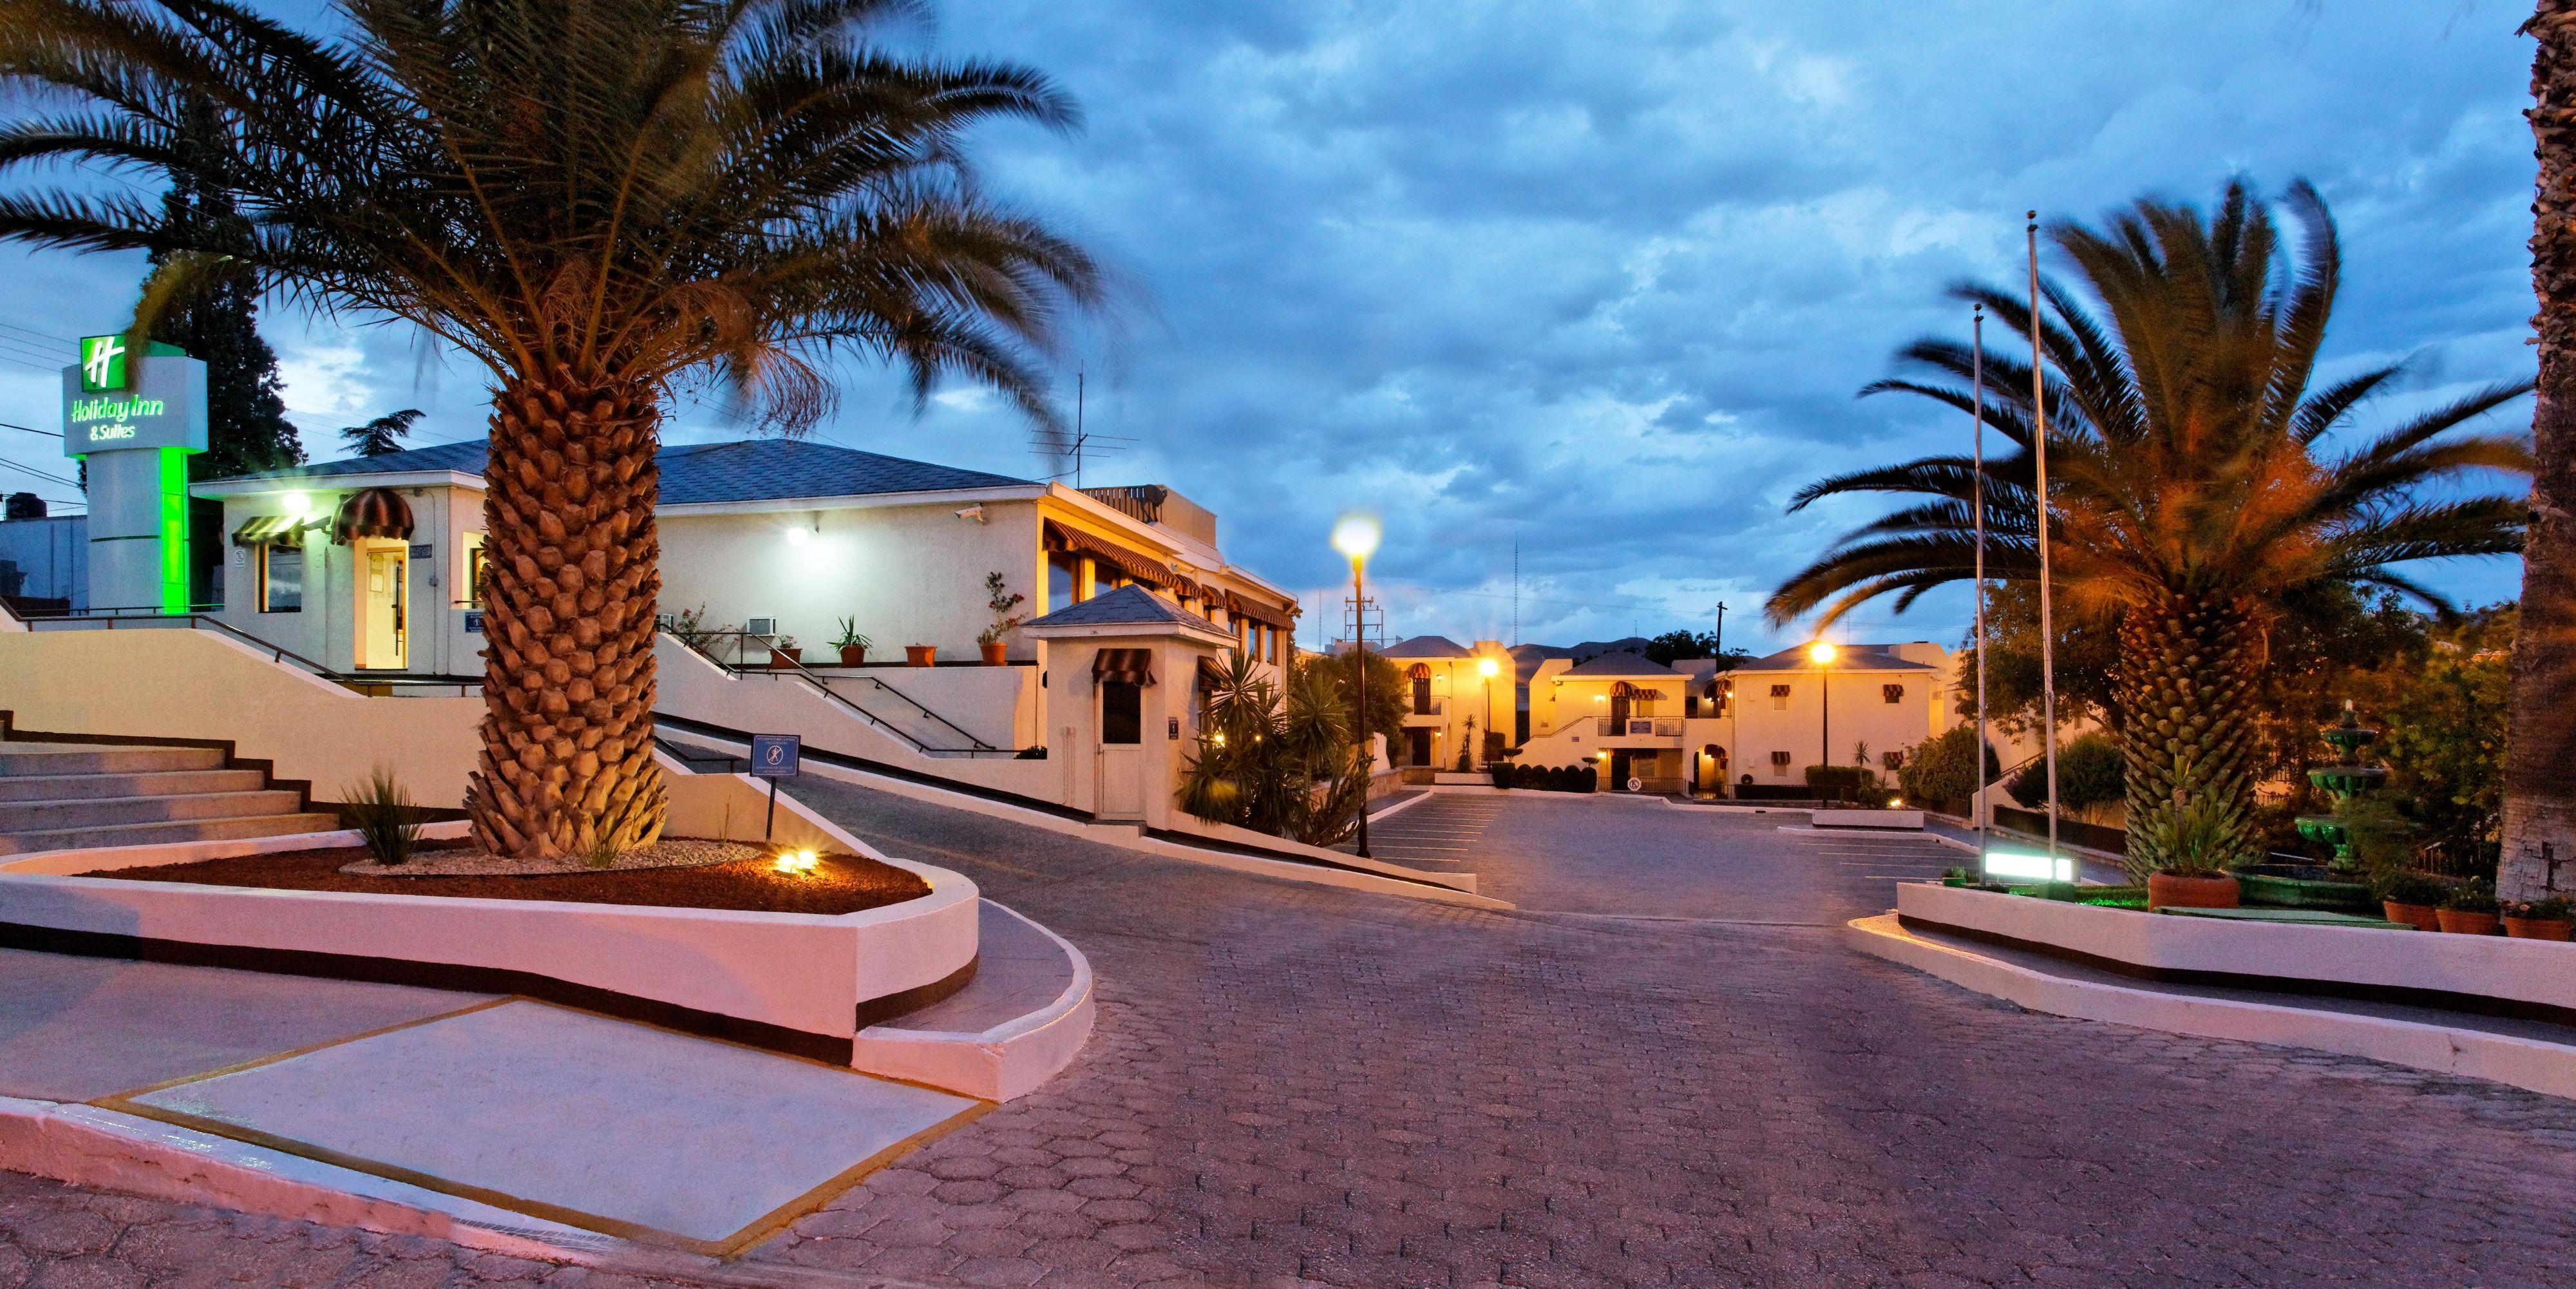 La palm hotel ghana website dating